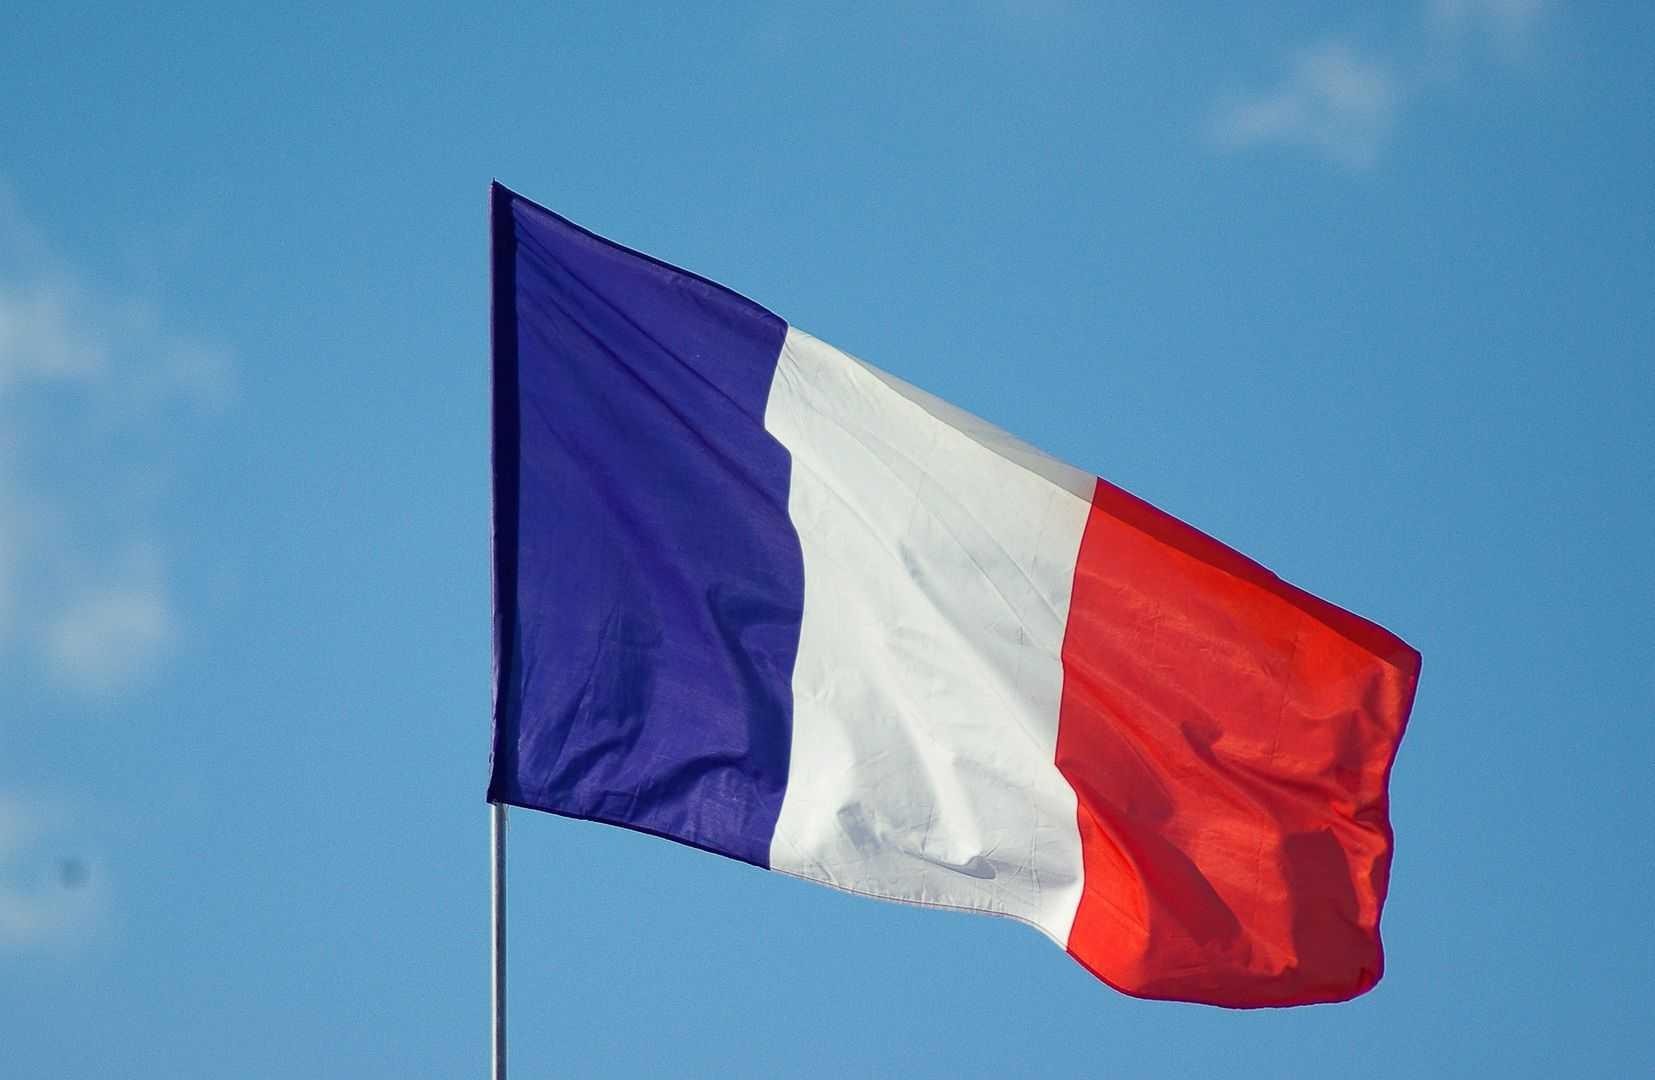 SME SHIPPING บริการส่งของไปฝรั่งเศส ส่งพัสดุไปฝรั่งเศส เราทำให้การส่งของเป็นเรื่องง่ายแค่ปลายนิ้ว ส่งของจากไทยไปฝรั่งเศส อัตราค่าส่งของไปฝรั่งเศส ค่าส่งของไปฝรั่งเศส อัตราค่าส่งพัสดุไปฝรั่งเศส ค่าส่งพัสดุไปฝรั่งเศส ค่าส่งไปรษณีย์ไปฝรั่งเศส ส่ง EMS ไปฝรั่งเศส ส่งของไปฝรั่งเศสทางเครื่องบิน ส่งของไปฝรั่งเศสทางเรือ วิธีส่งของไปฝรั่งเศส ส่งจดหมายไปฝรั่งเศส ส่งเอกสารไปฝรั่งเศส ส่งอาหารไปฝรั่งเศส